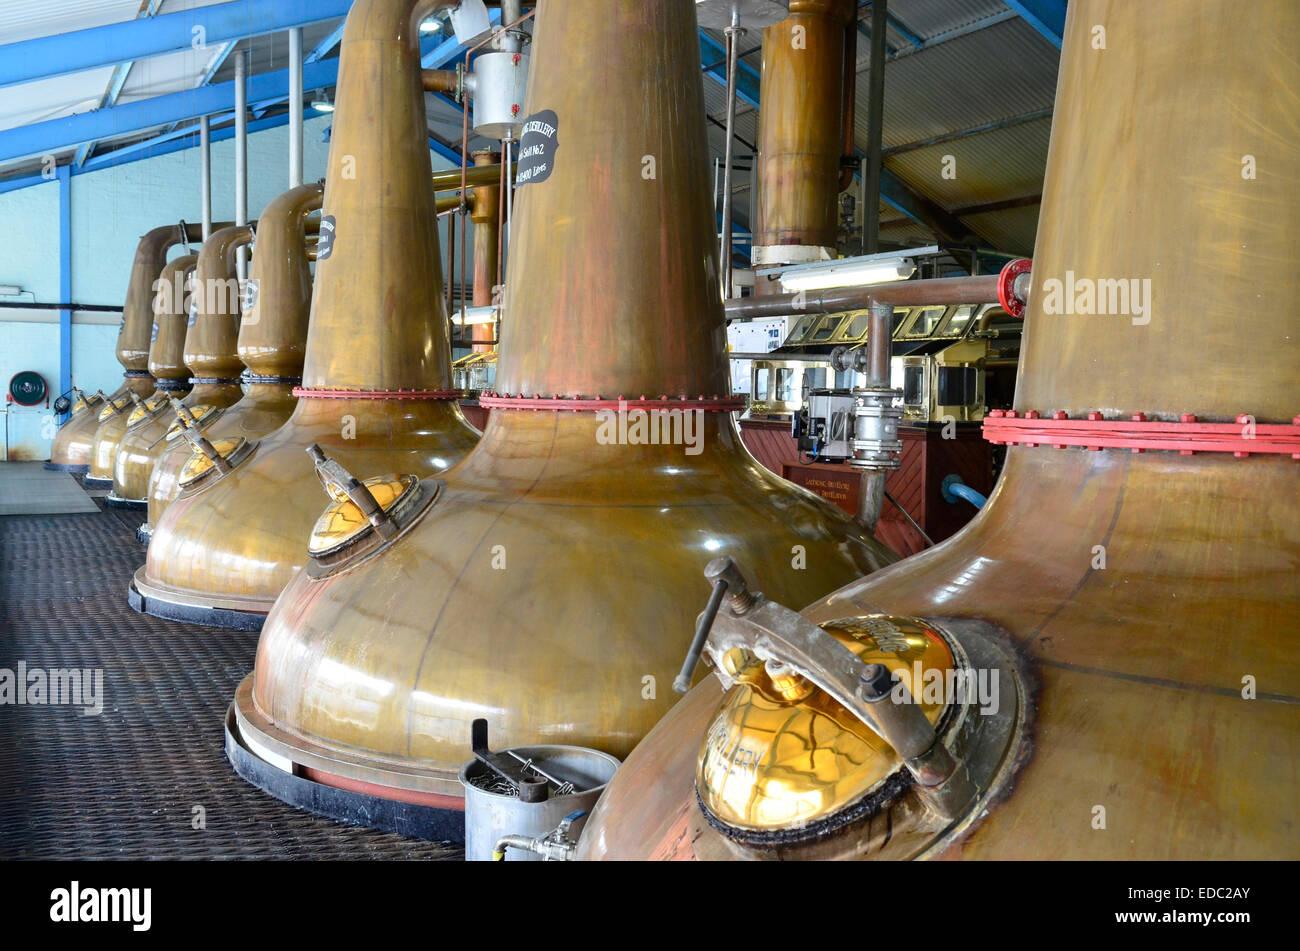 Copper Stills at the Laphroaig Distillery in Islay, Scotland - Stock Image